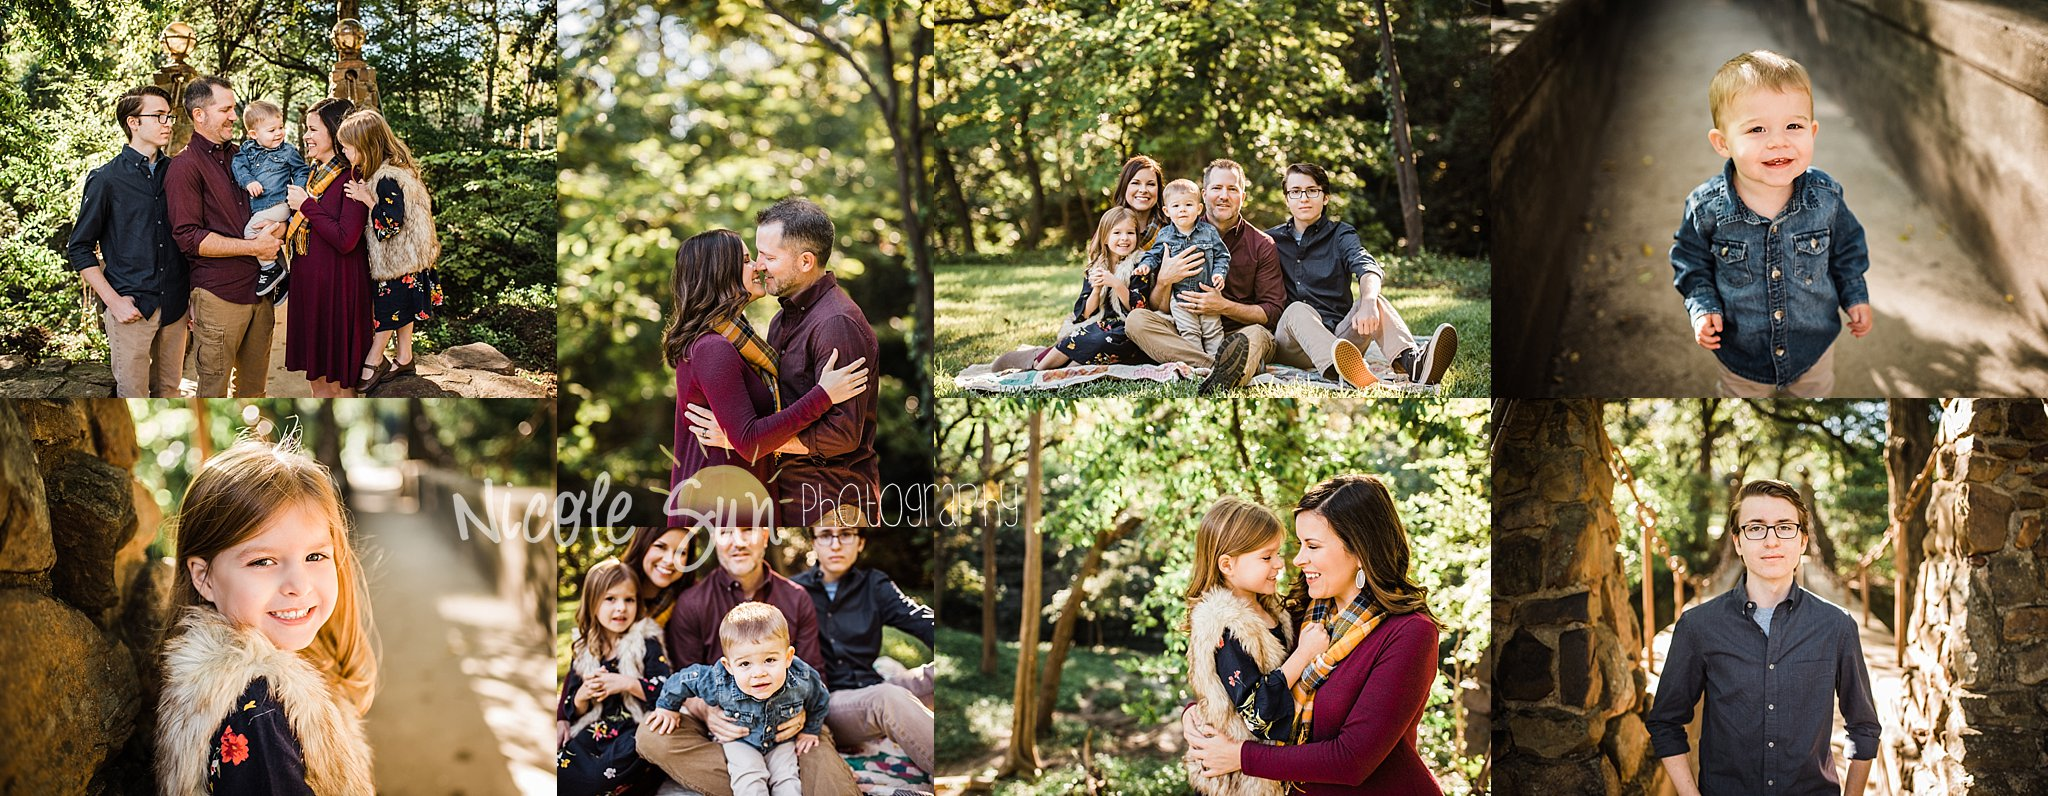 dallasfamilyphotography.jpg